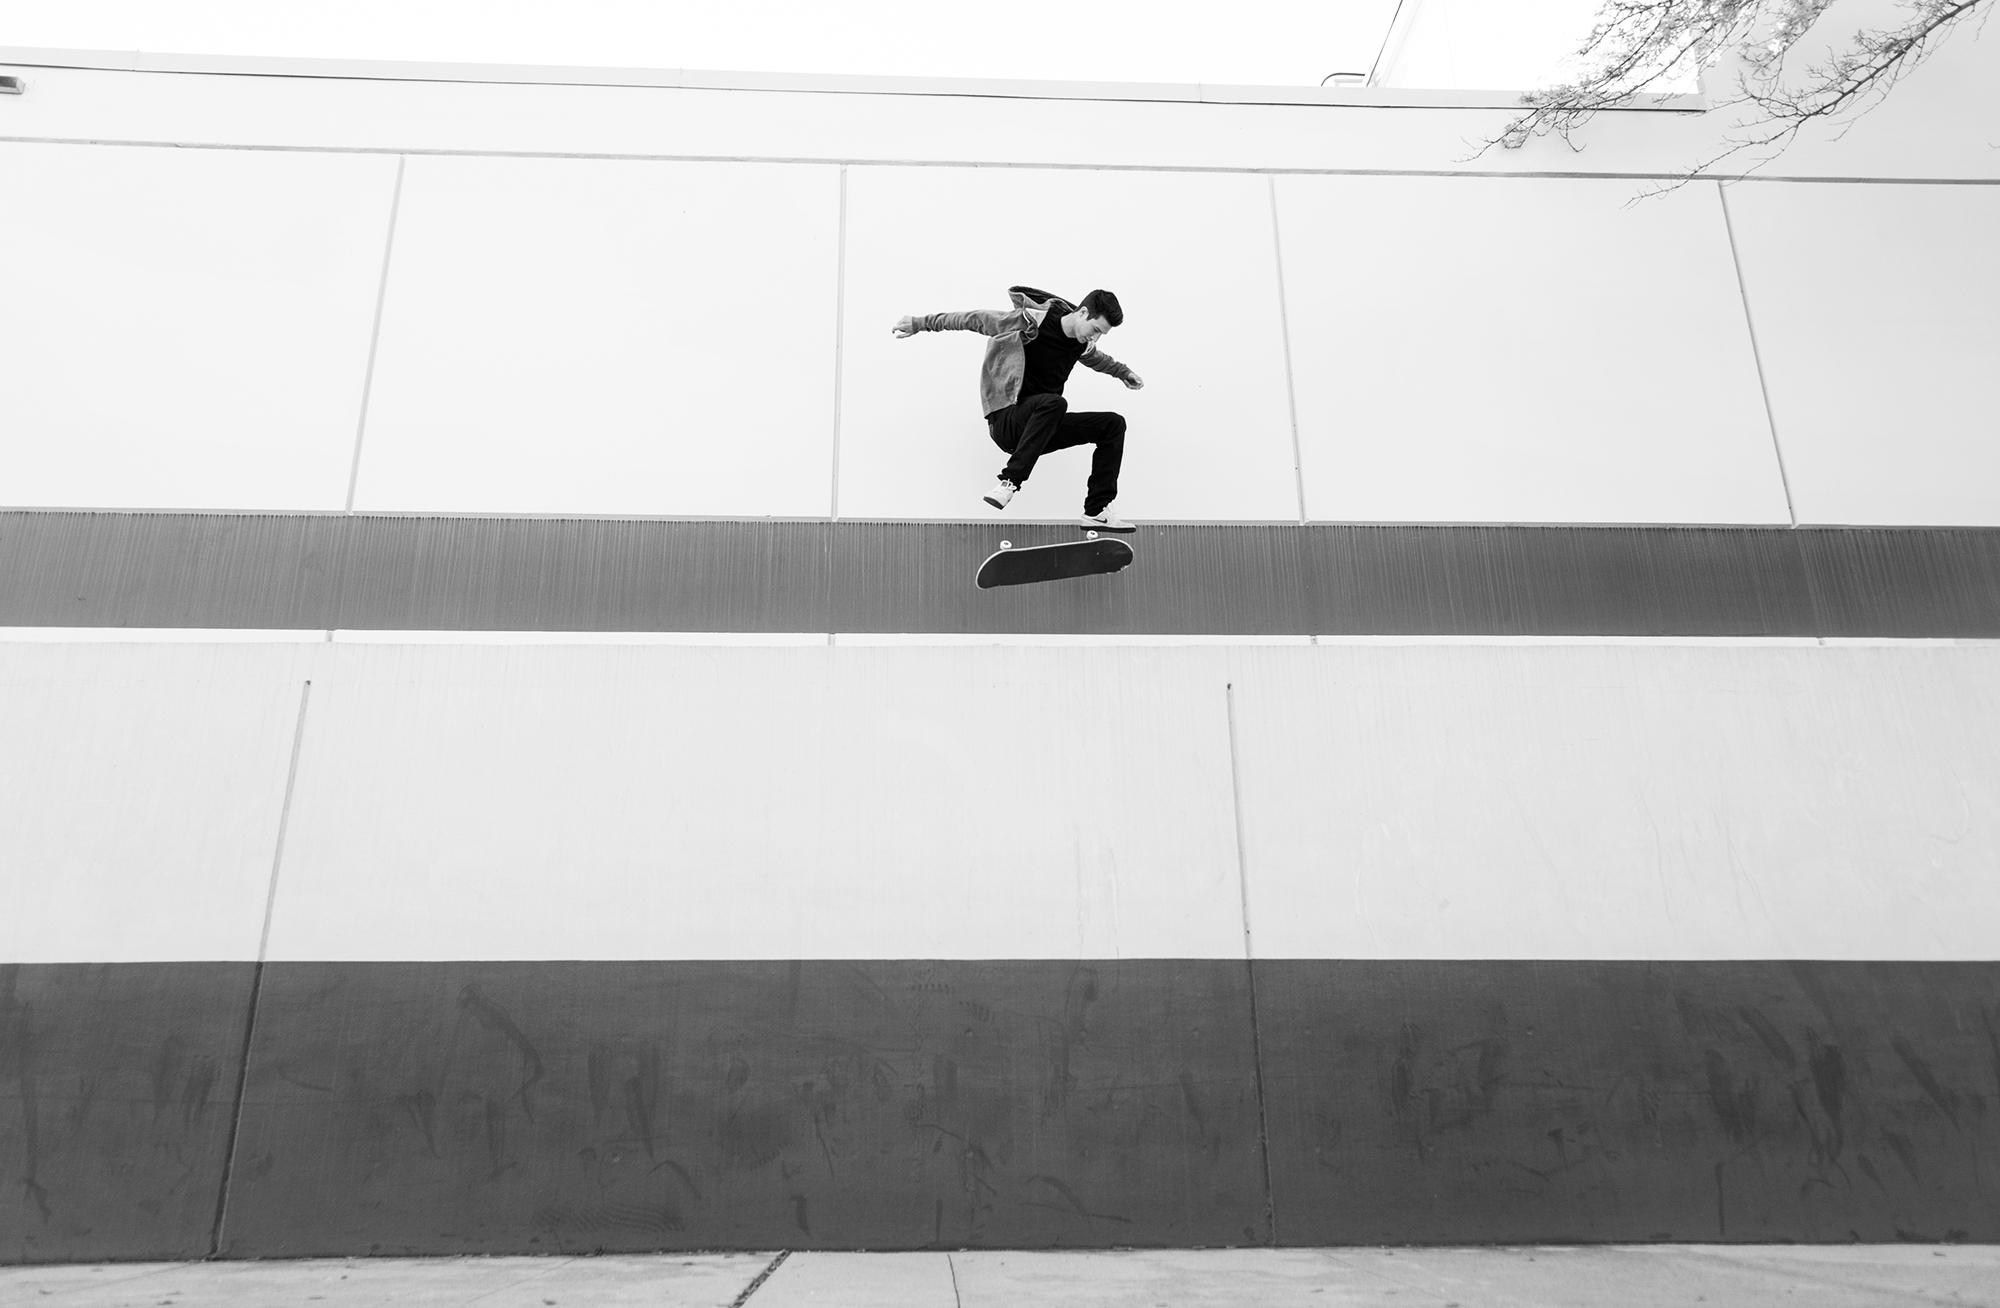 Brooks_D_Porfolio_Skate.jpg